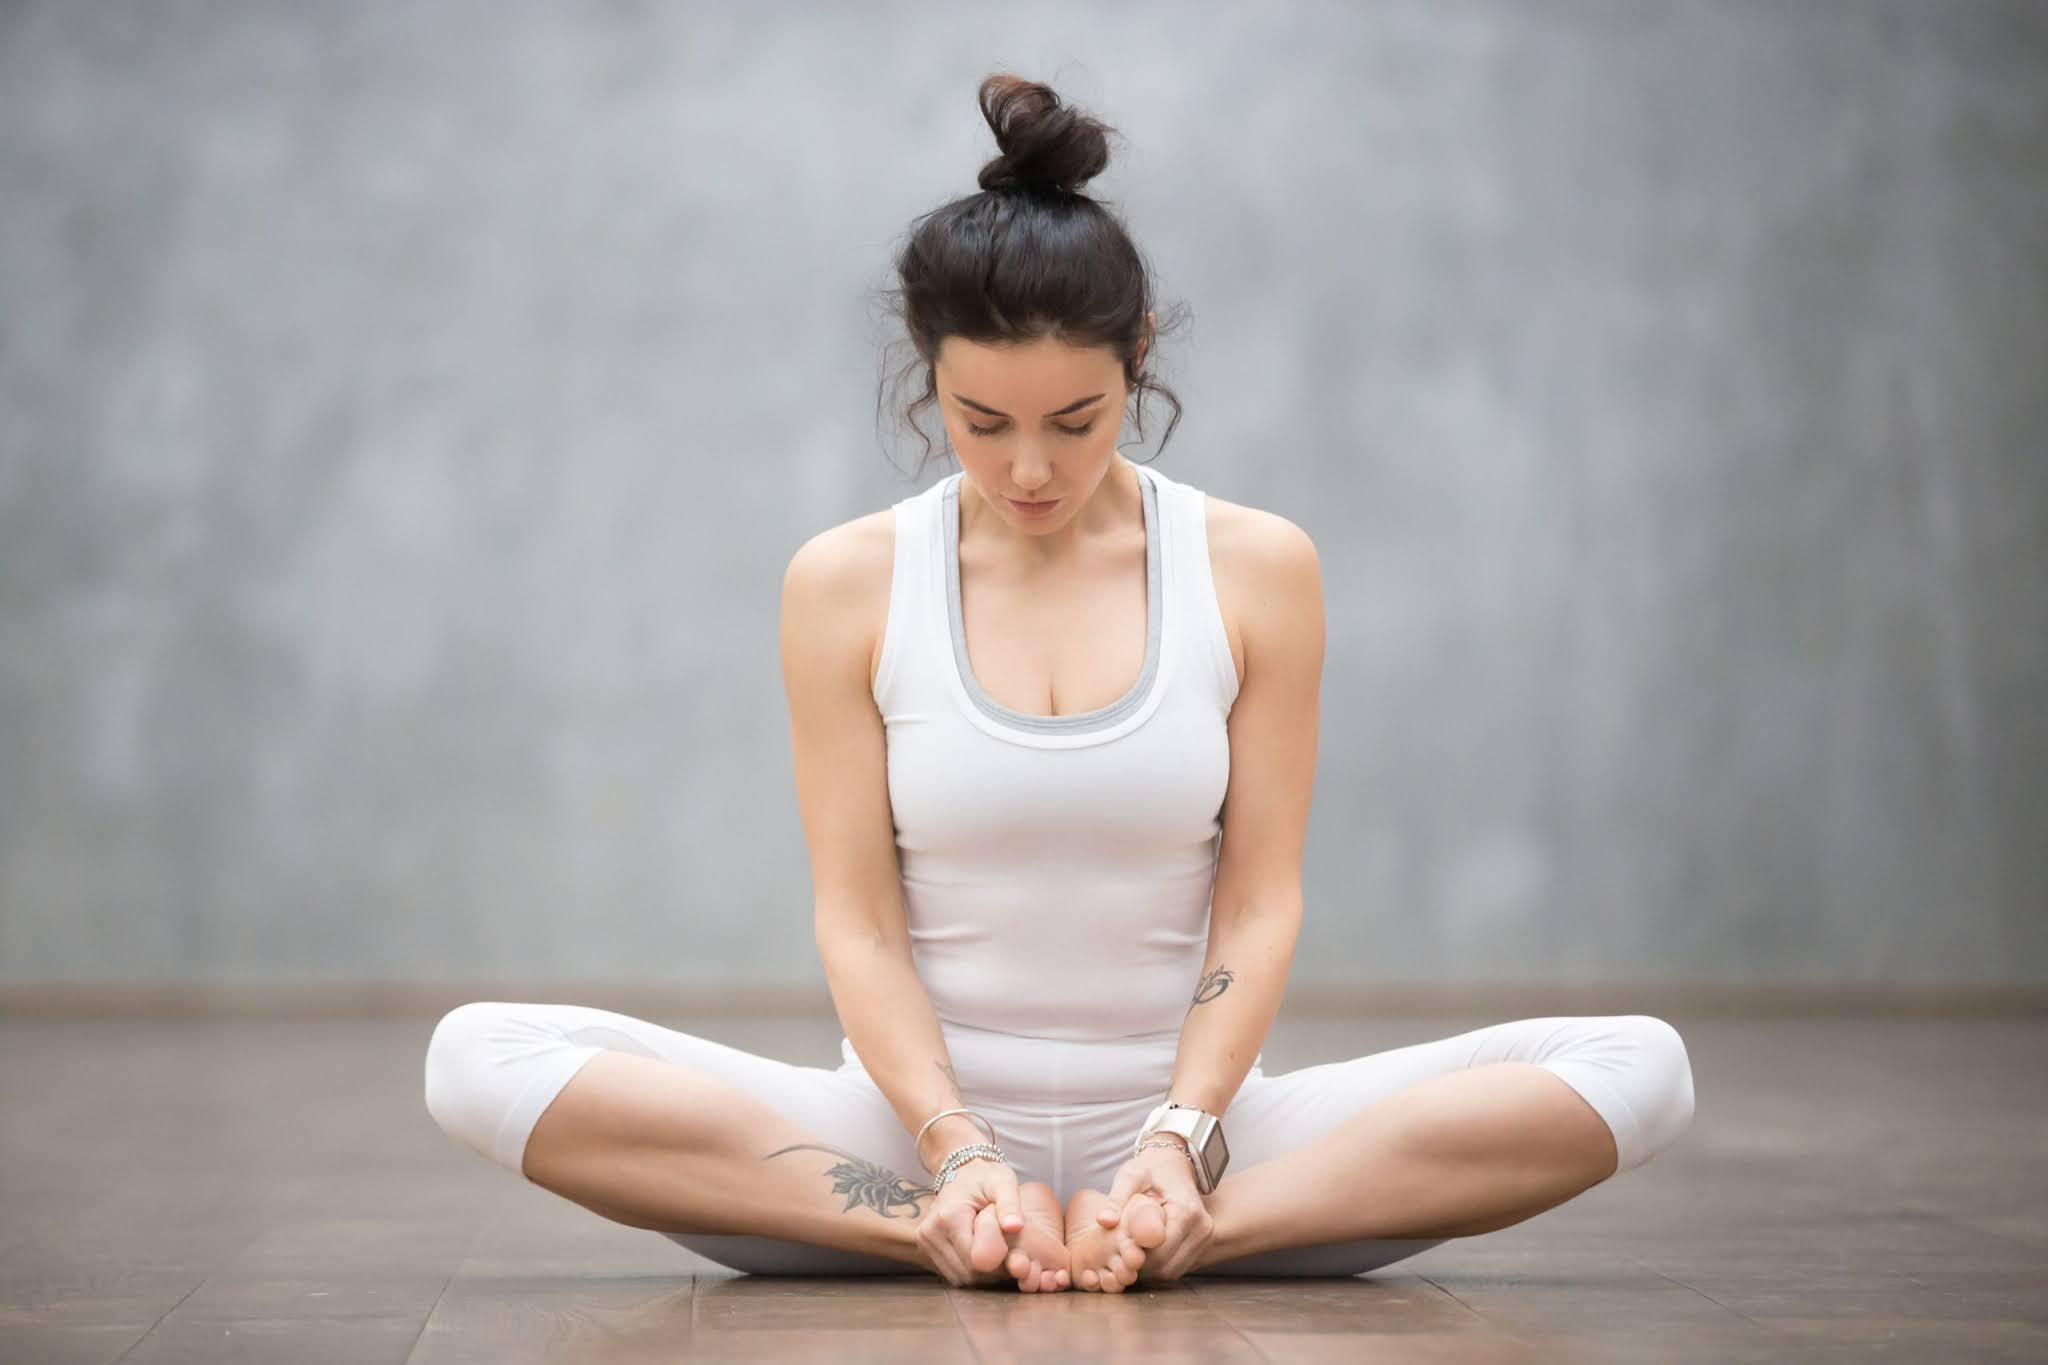 Baddha Konasana - Bound Angle Posture From Tadasana 4